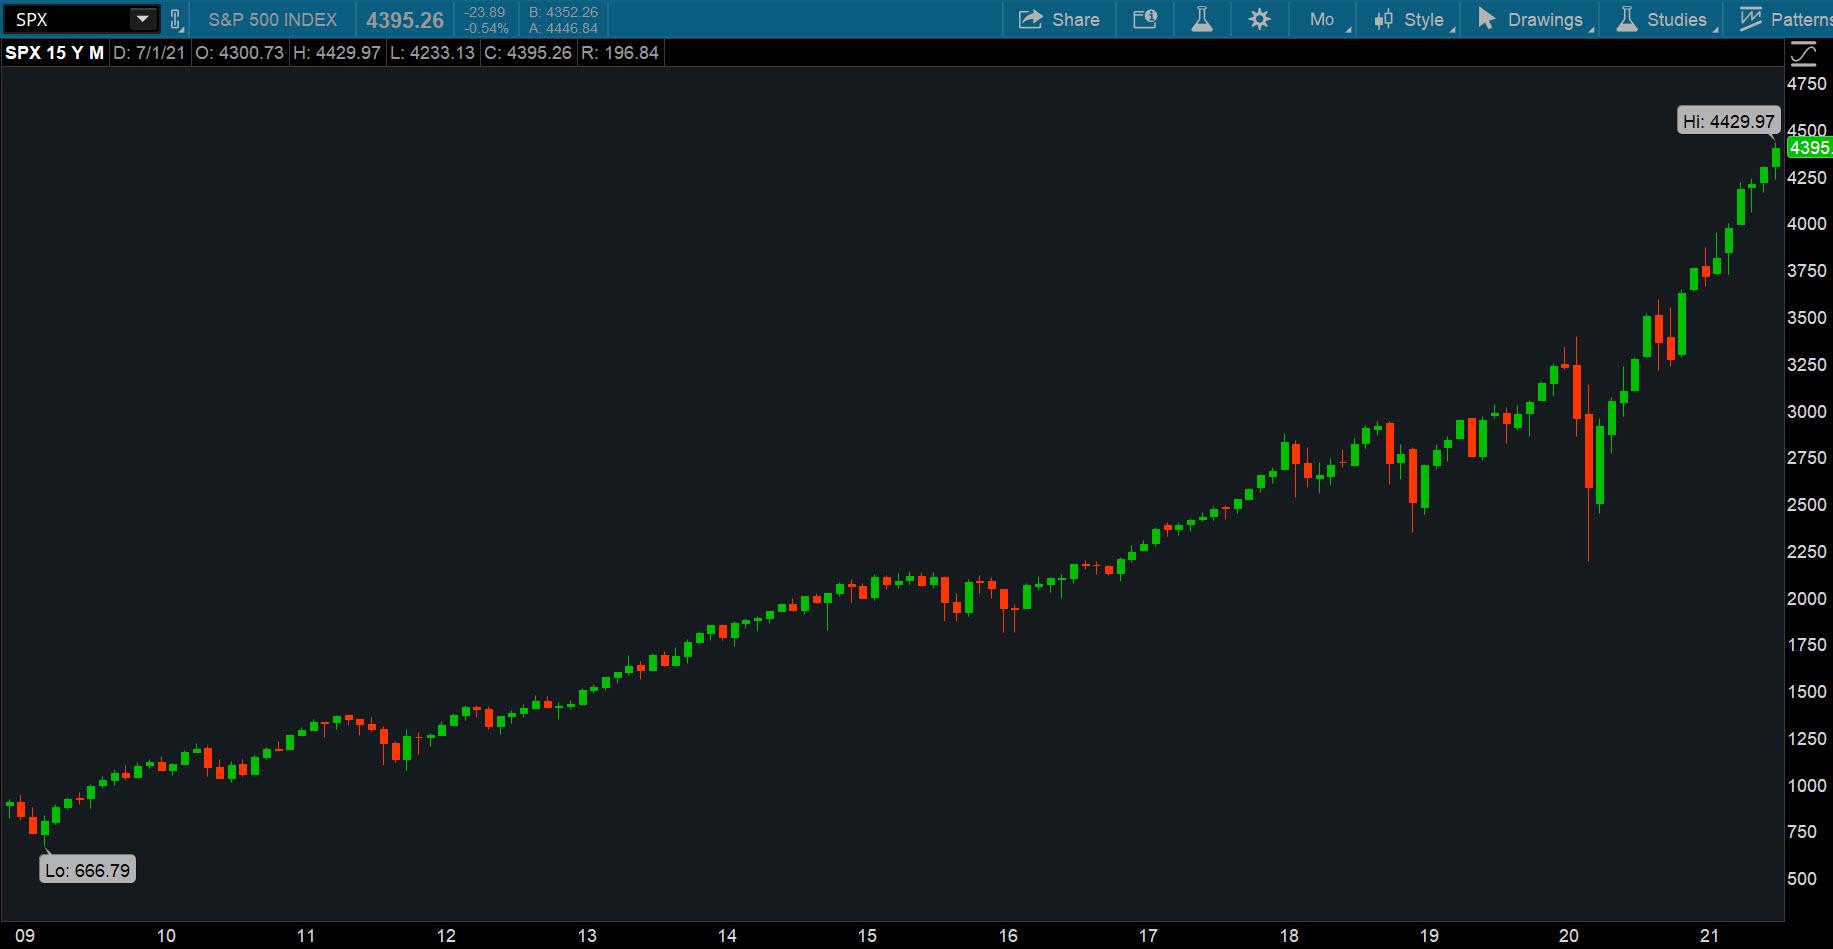 S&P 500 Index bull rally